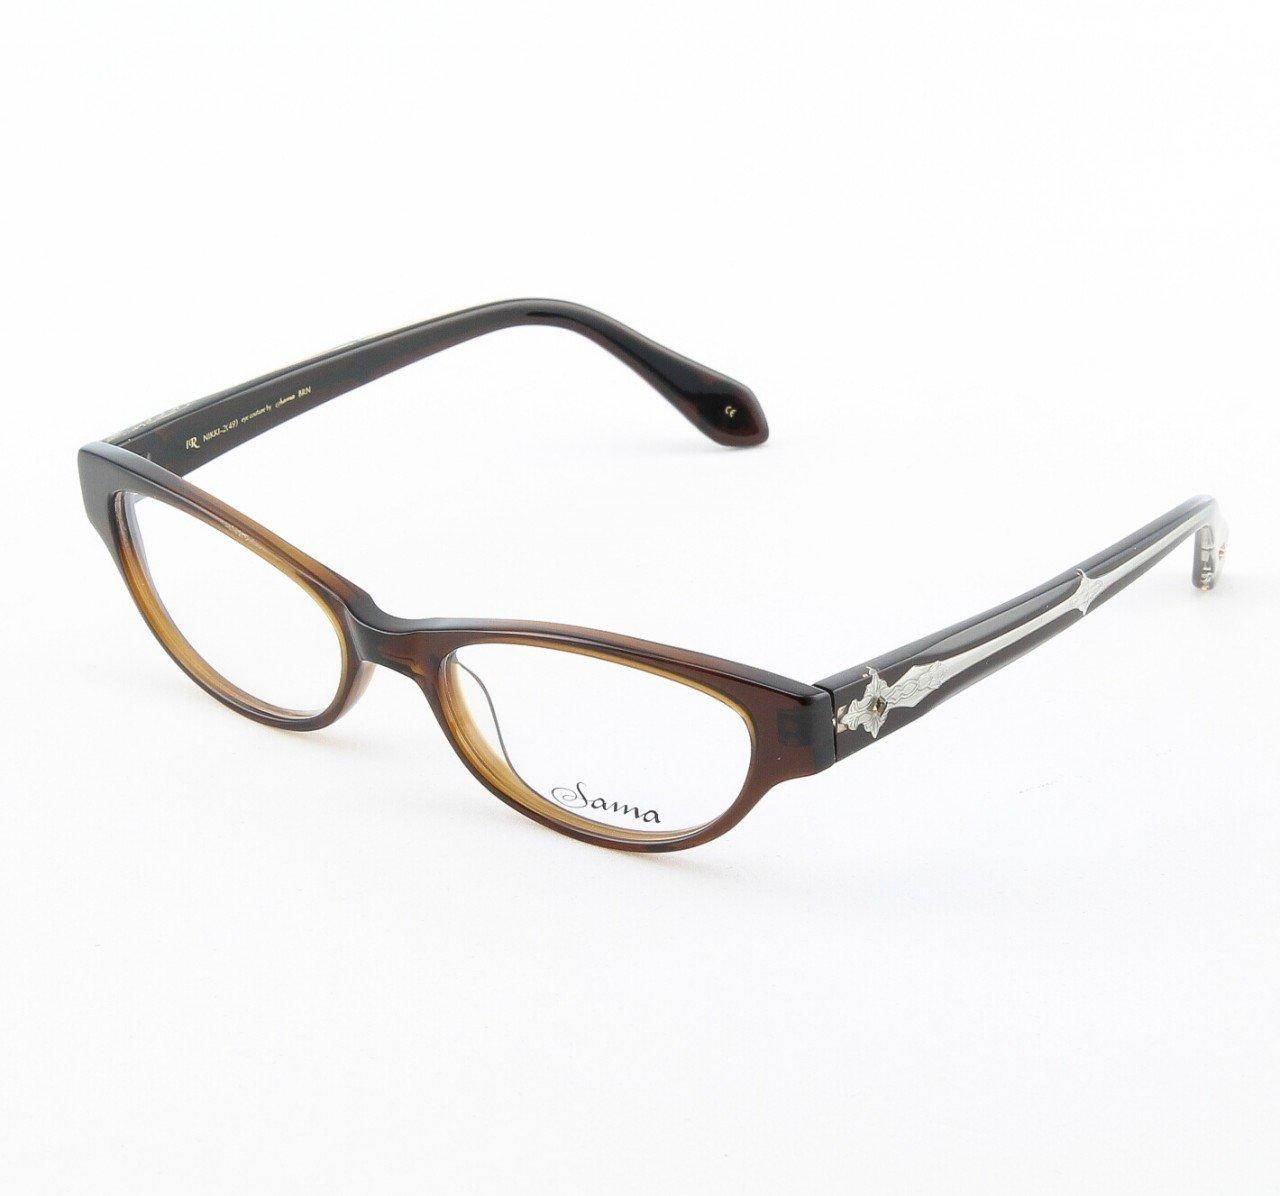 Loree Rodkin Nikki Eyeglasses Brown w/ Clear Lenses, Swarovski Crystals and Decorative Temple Core